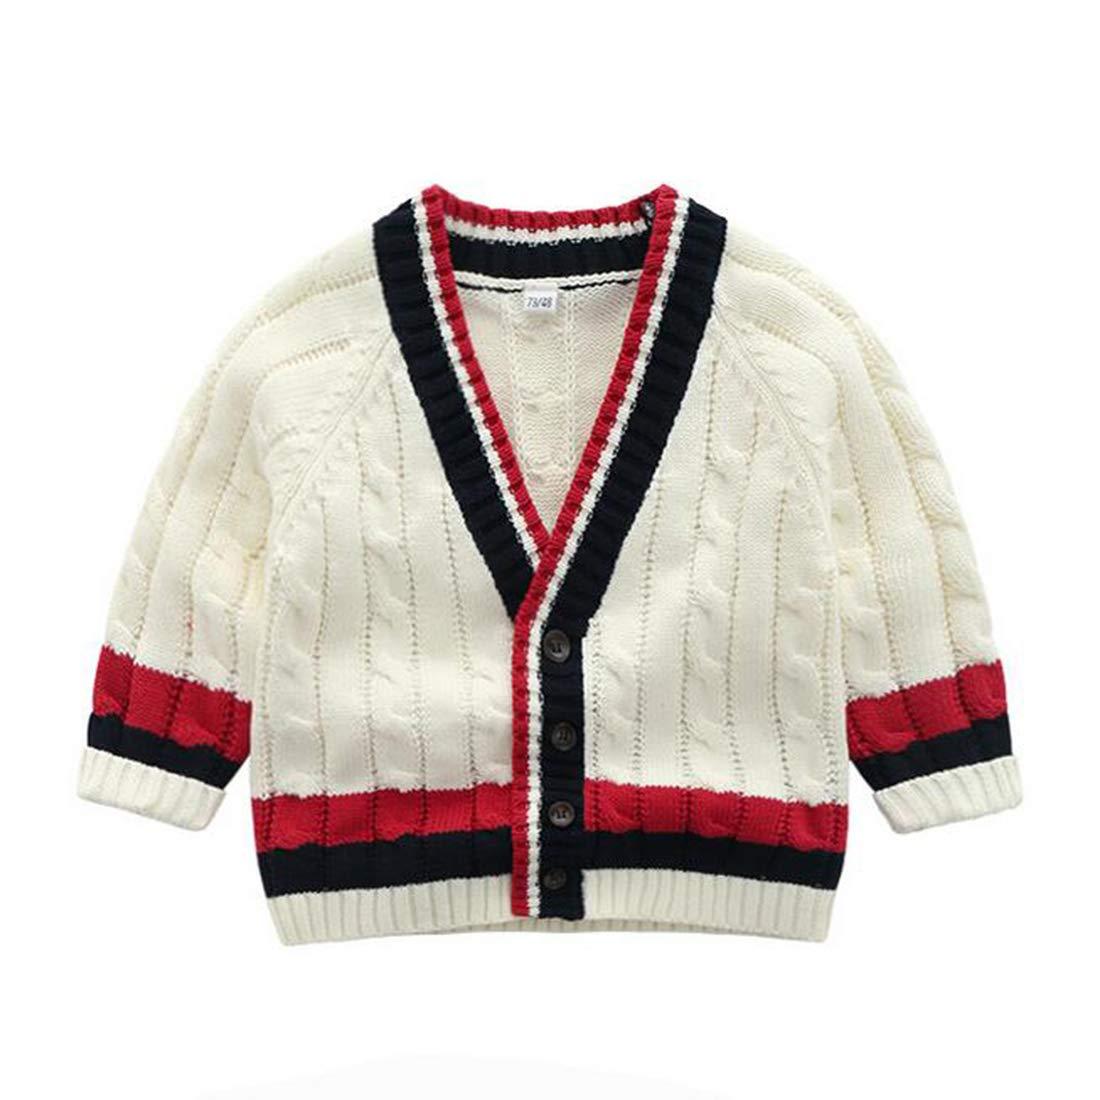 Fairy Baby Toddler Baby Boys Knitted Sweater Cardigan Gentle School Uniform Outwear Jacket